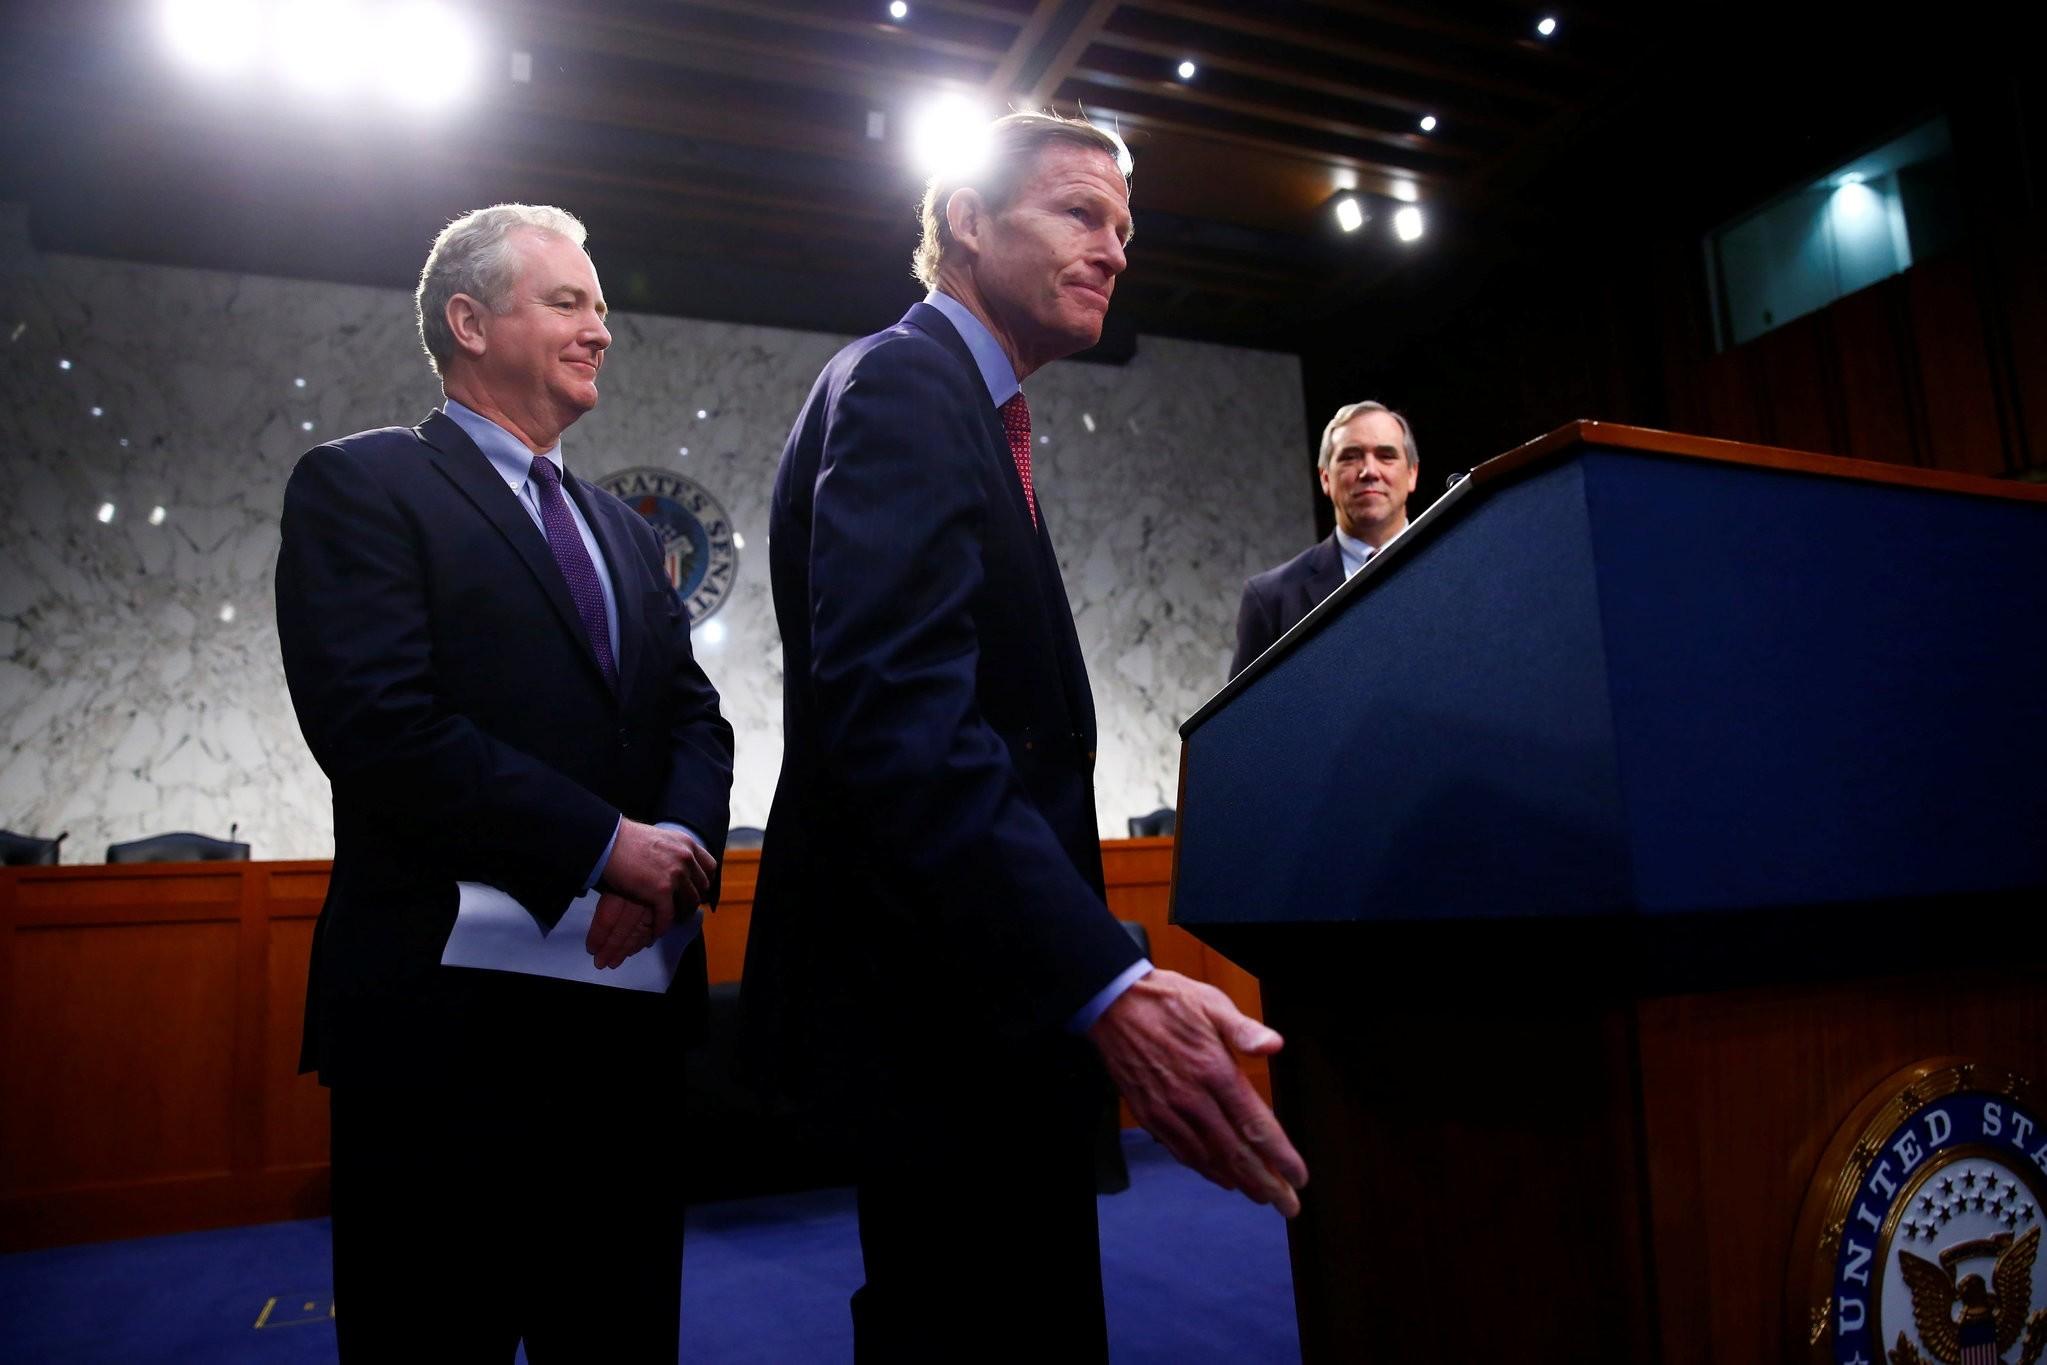 Sen. Richard Blumenthal, Sen. Jeff Merkley and Sen. Christopher Van Hollen hold a press conference in opposition of Neil Gorsuch. (REUTERS Photo)